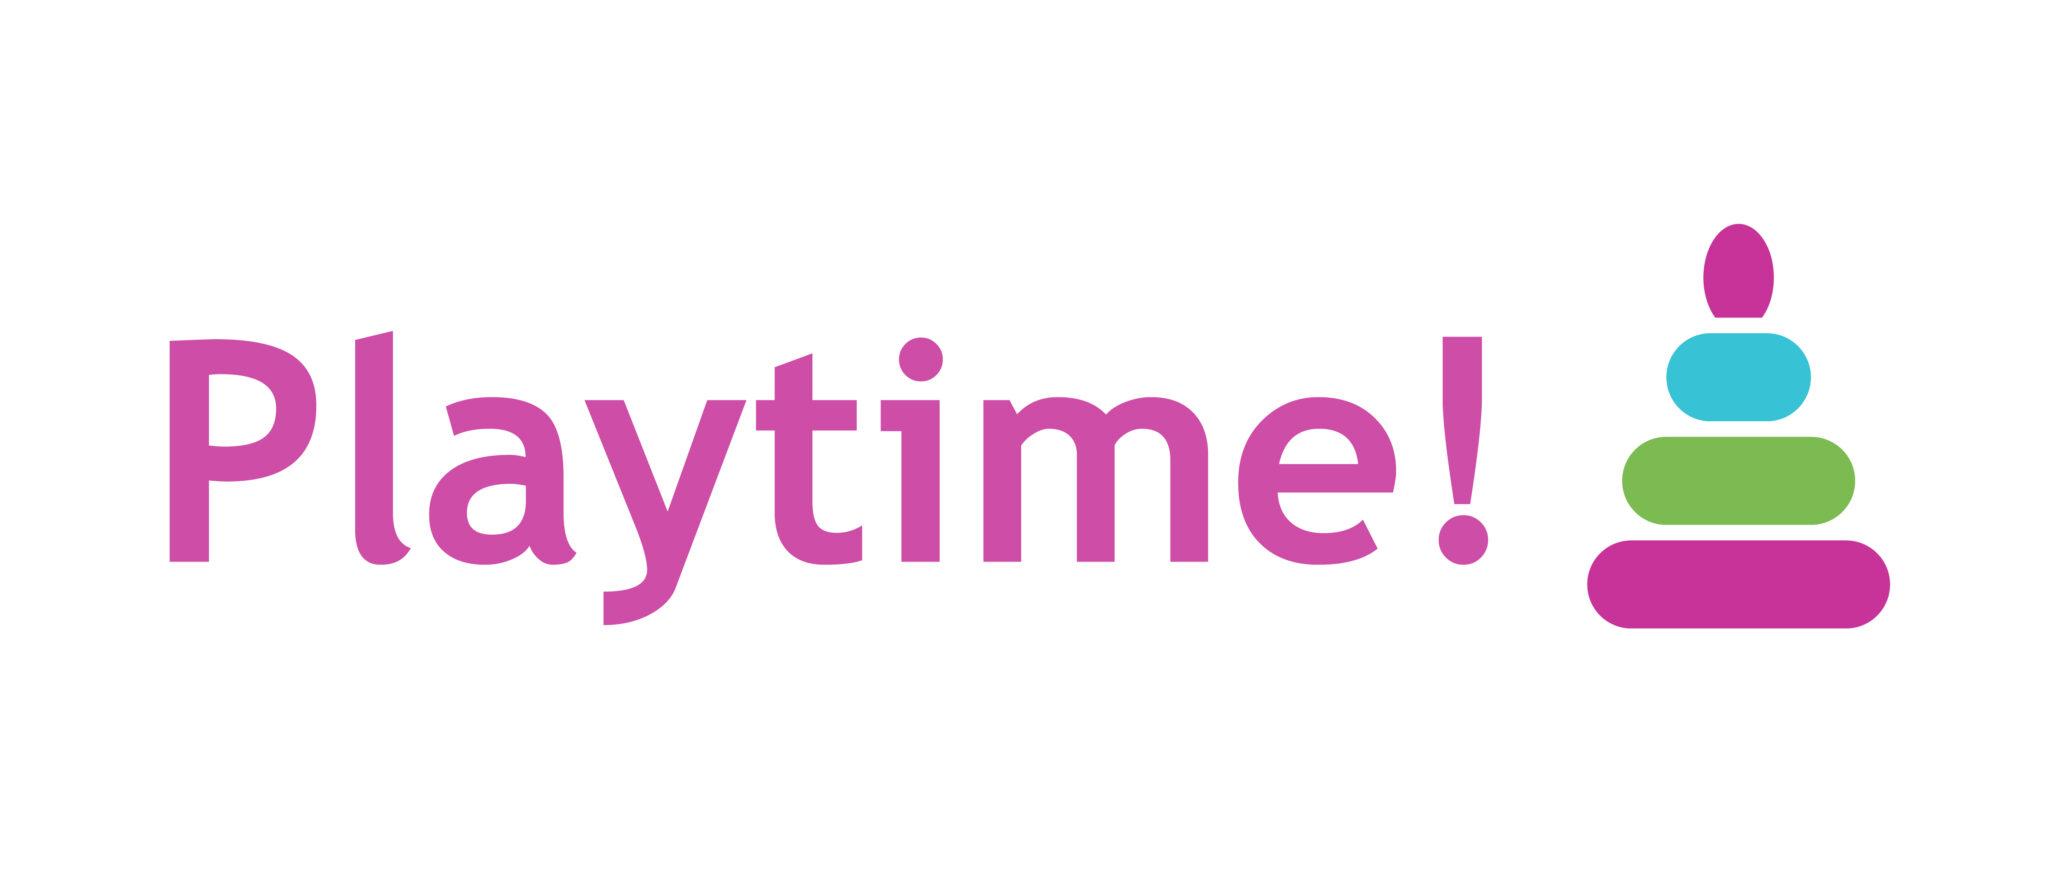 singplay_playtime_logo_toddlermusicclass_kindermusik